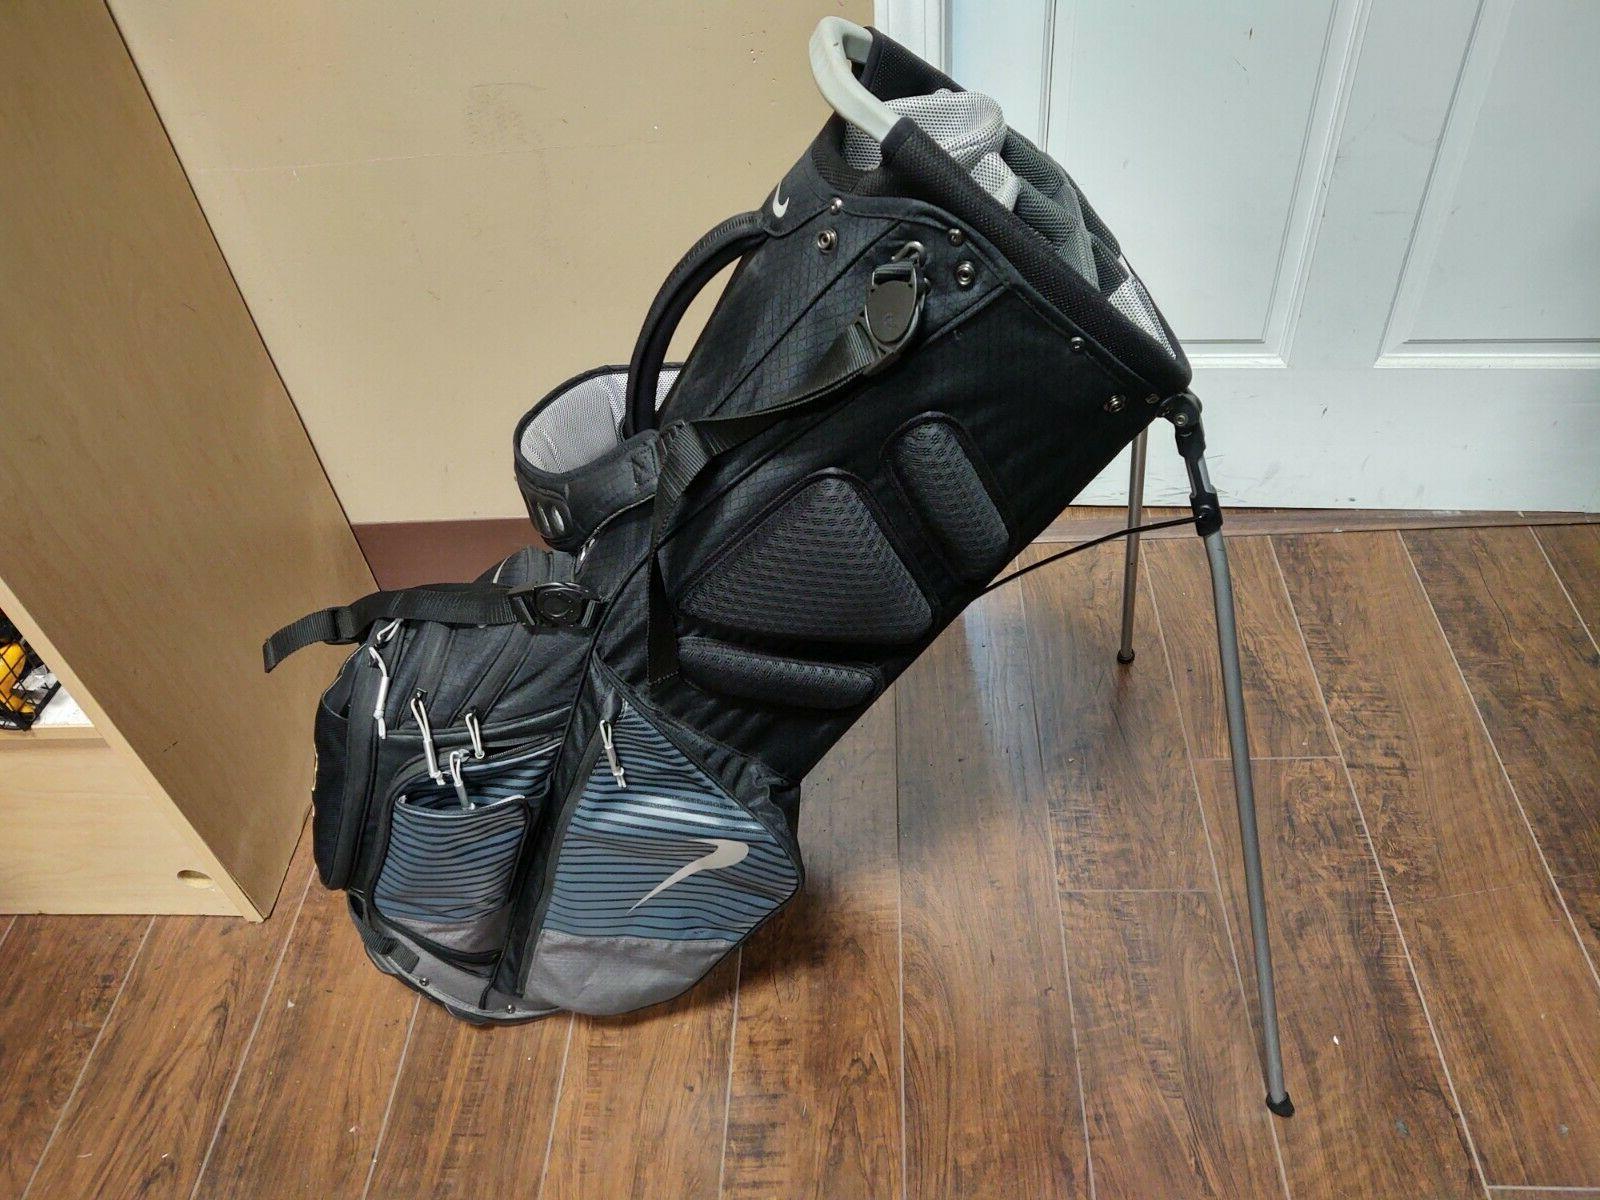 Nike Air Hybrid Divider Strap Golf Stand Black/Gray